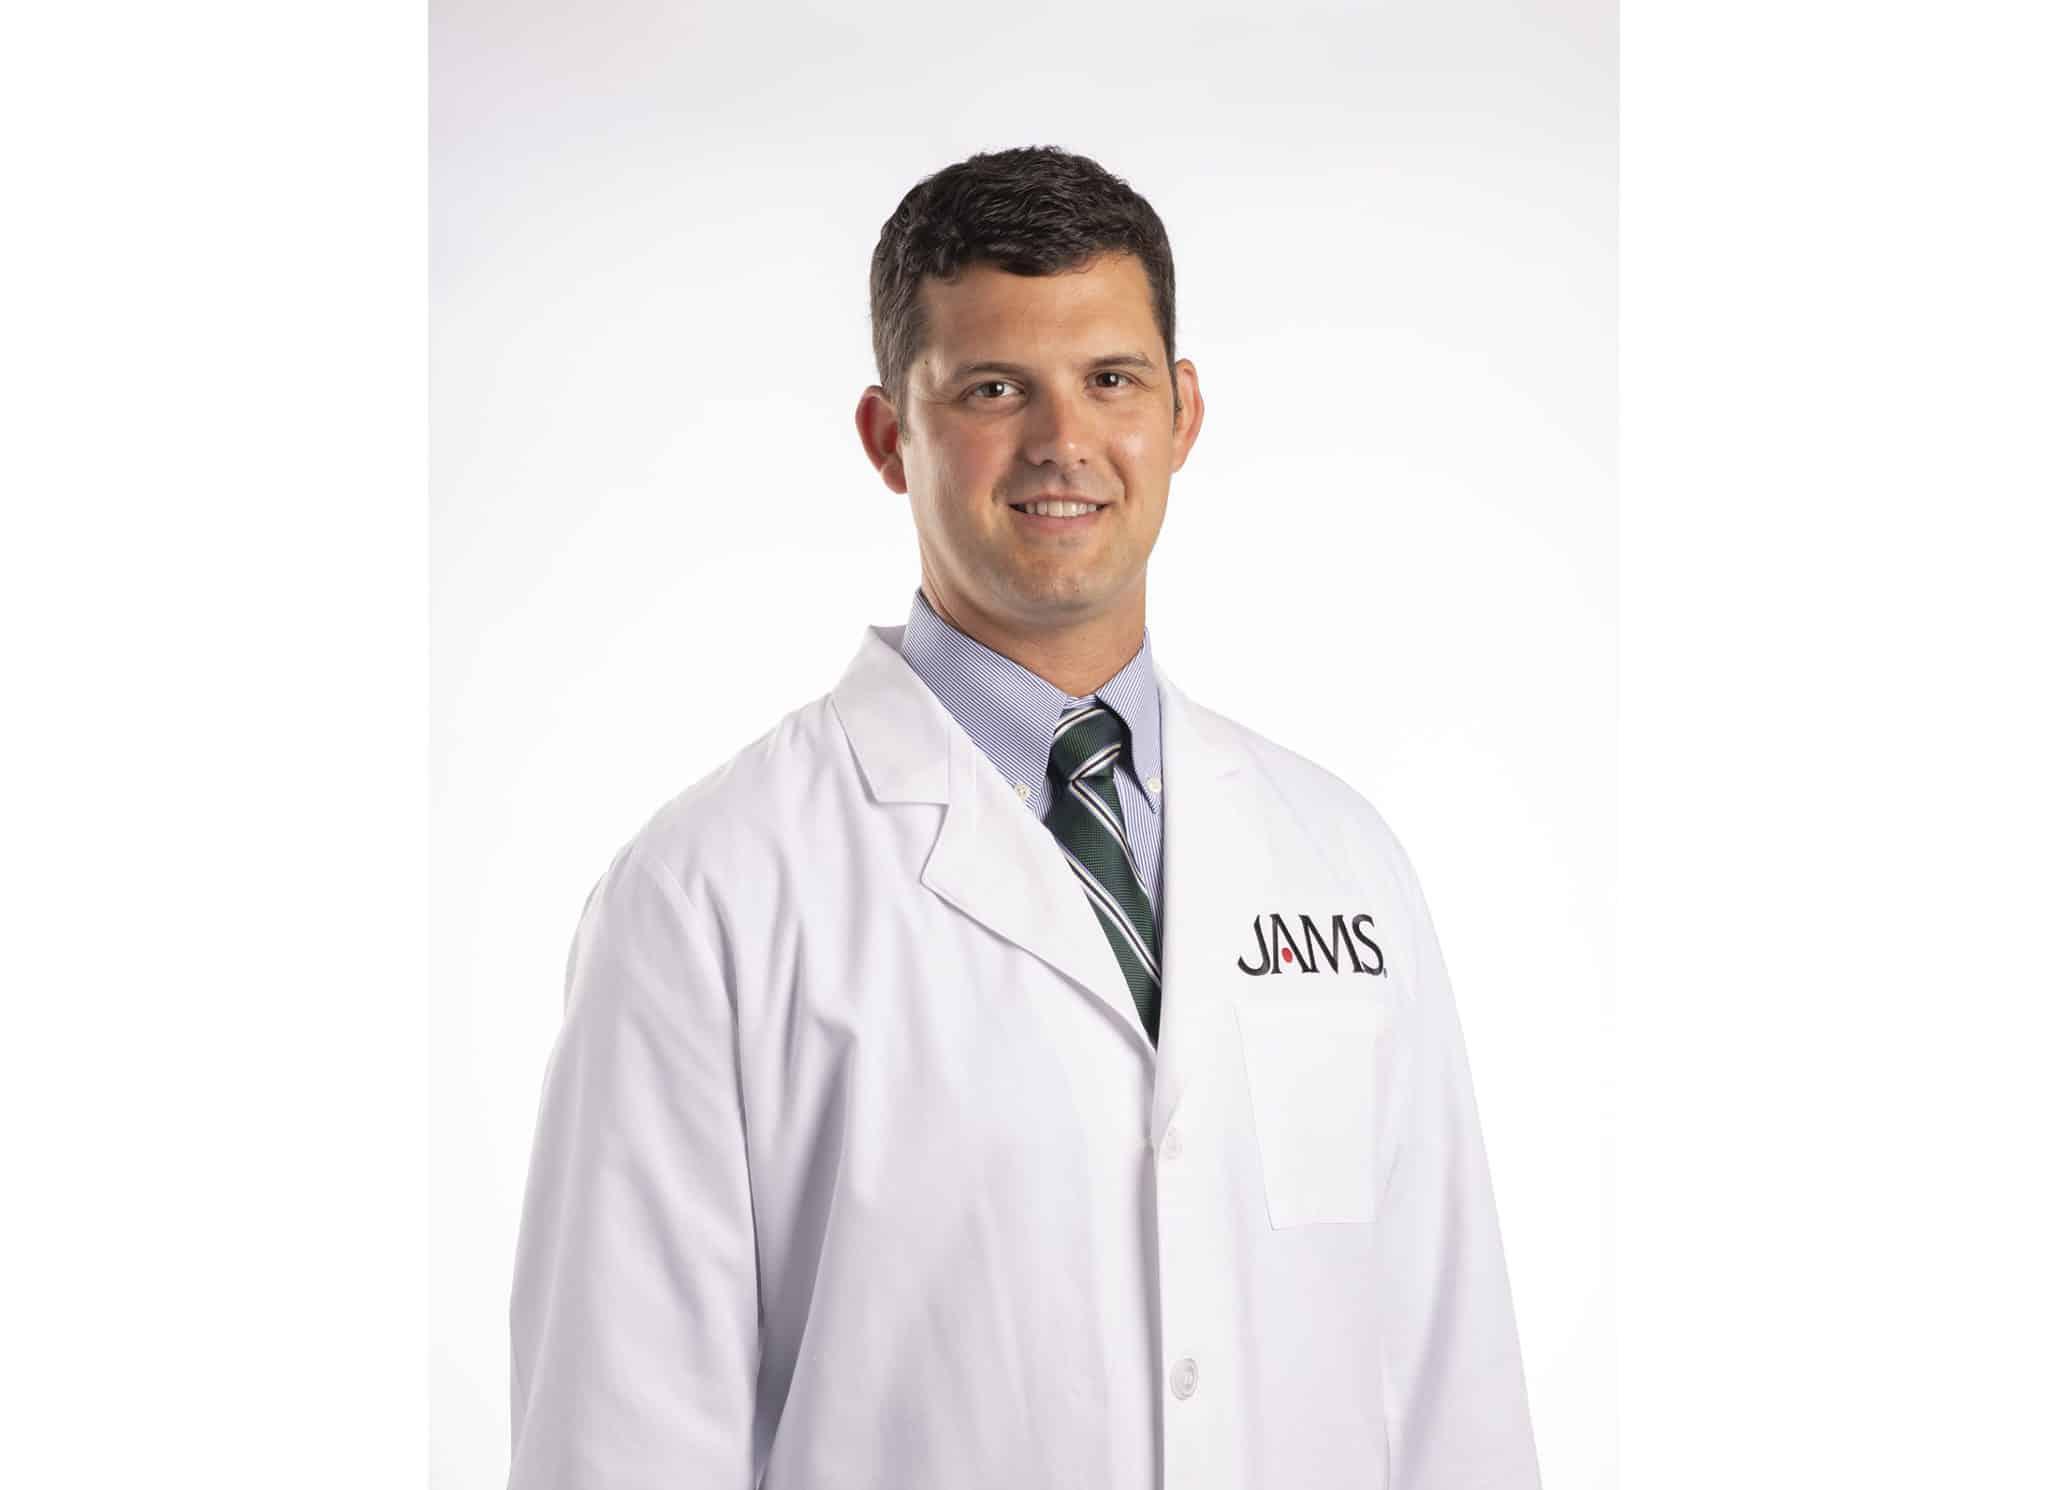 Dr. McCormack